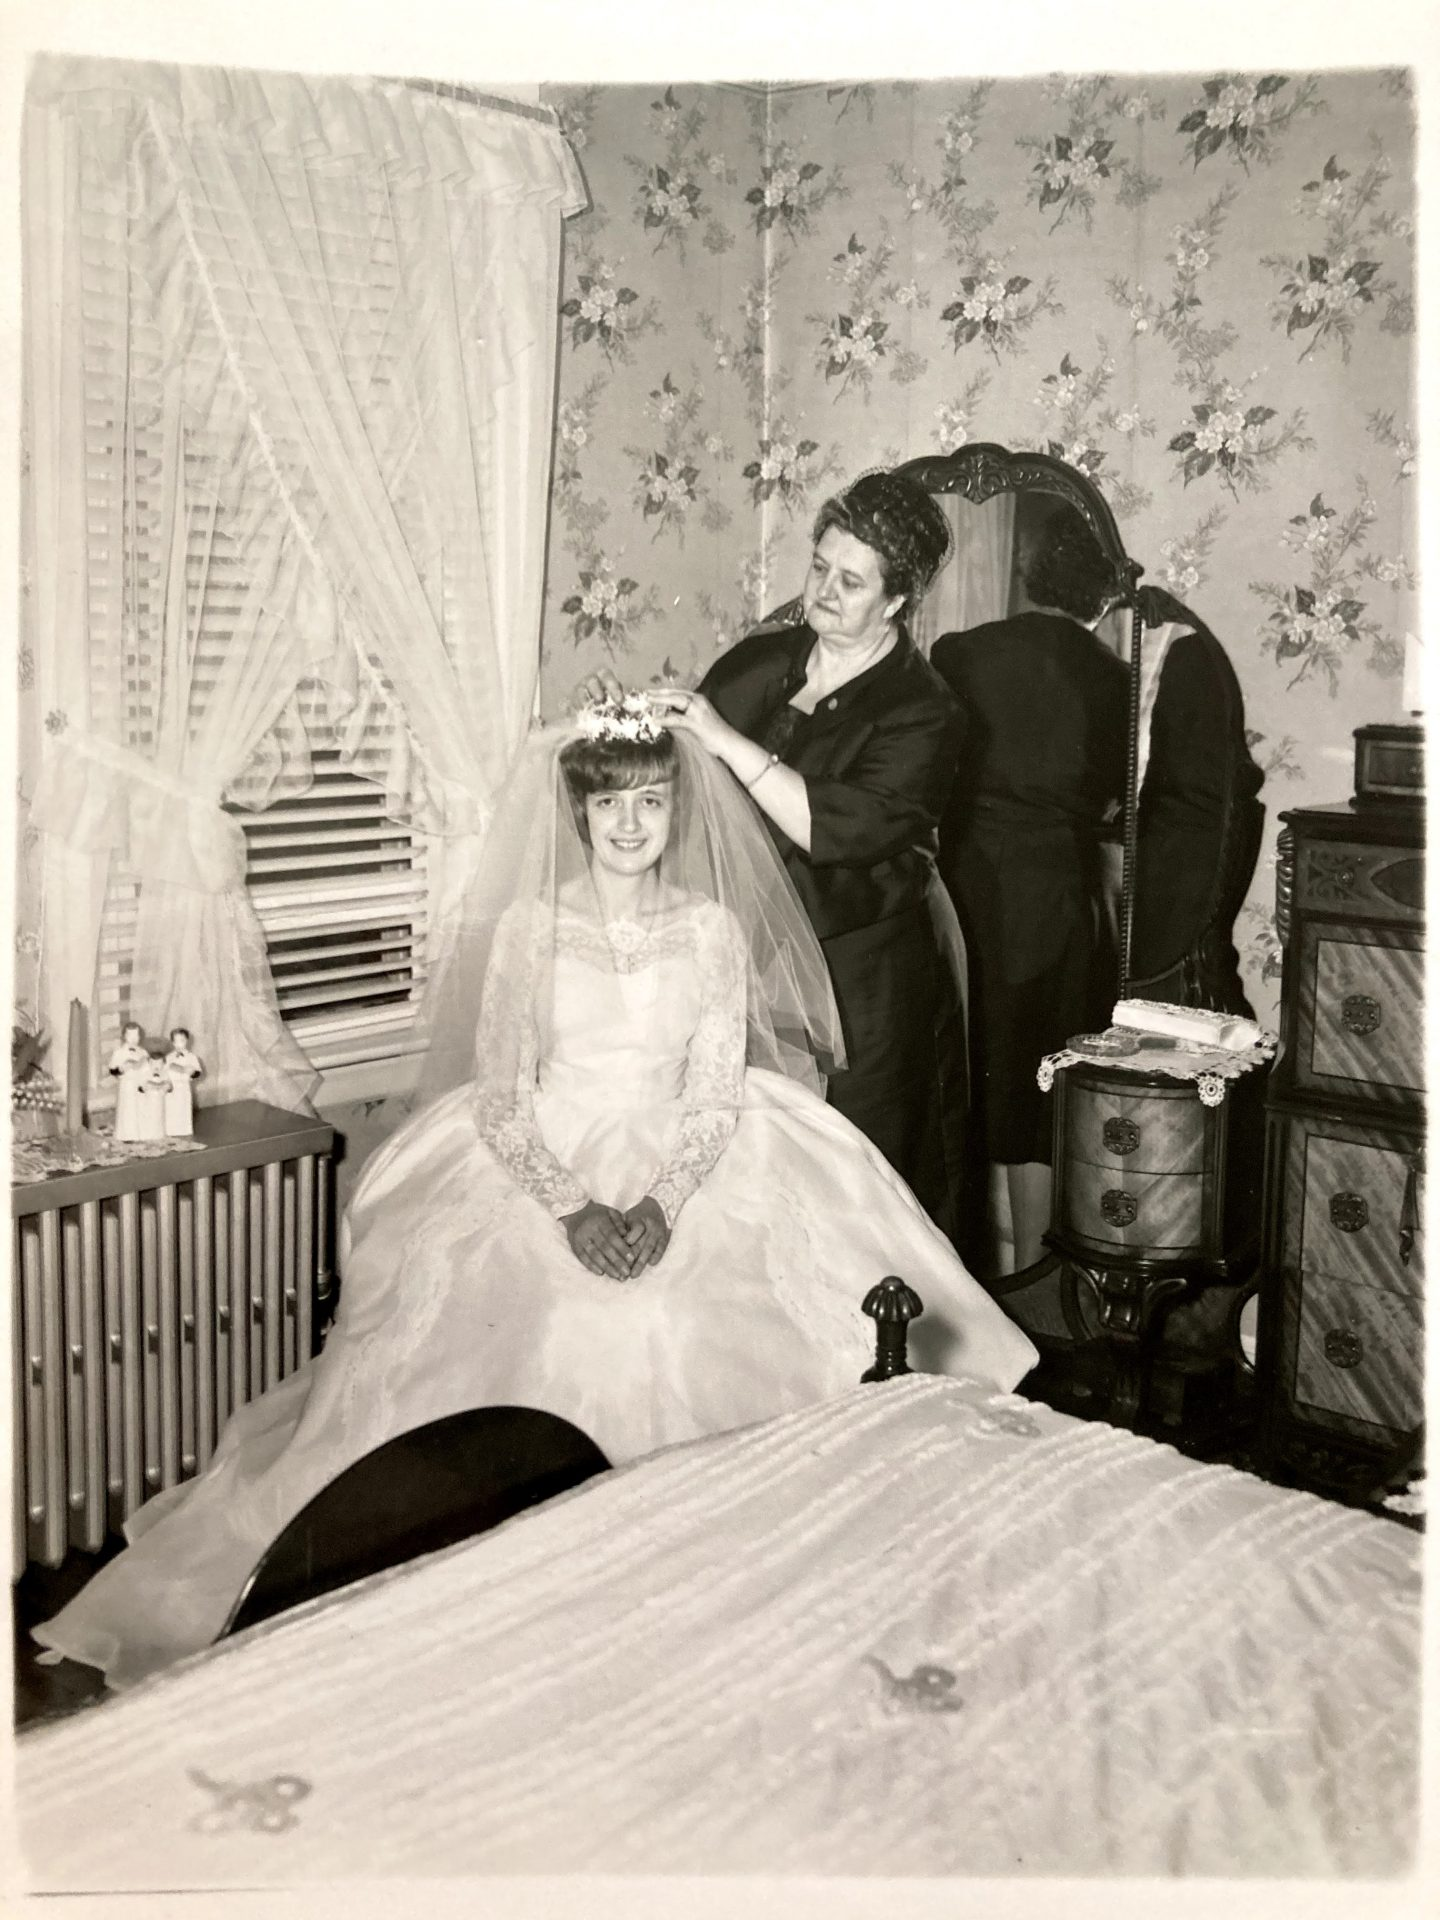 Charlotte and her mother, Helen Karolczak, on her wedding day.